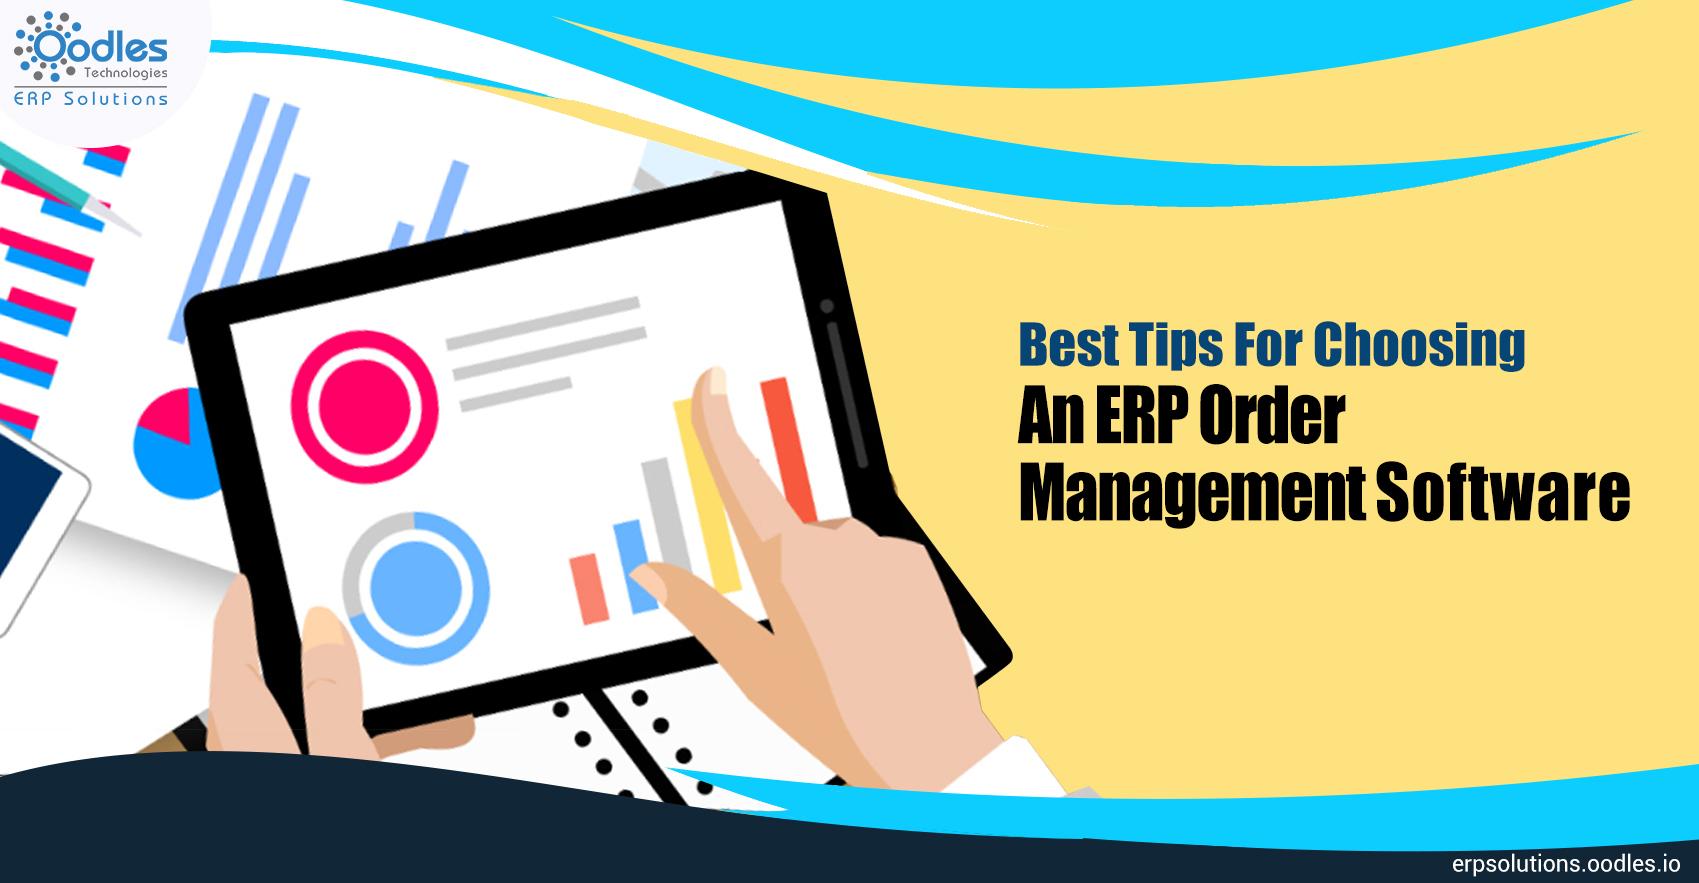 ERP Order Management Software